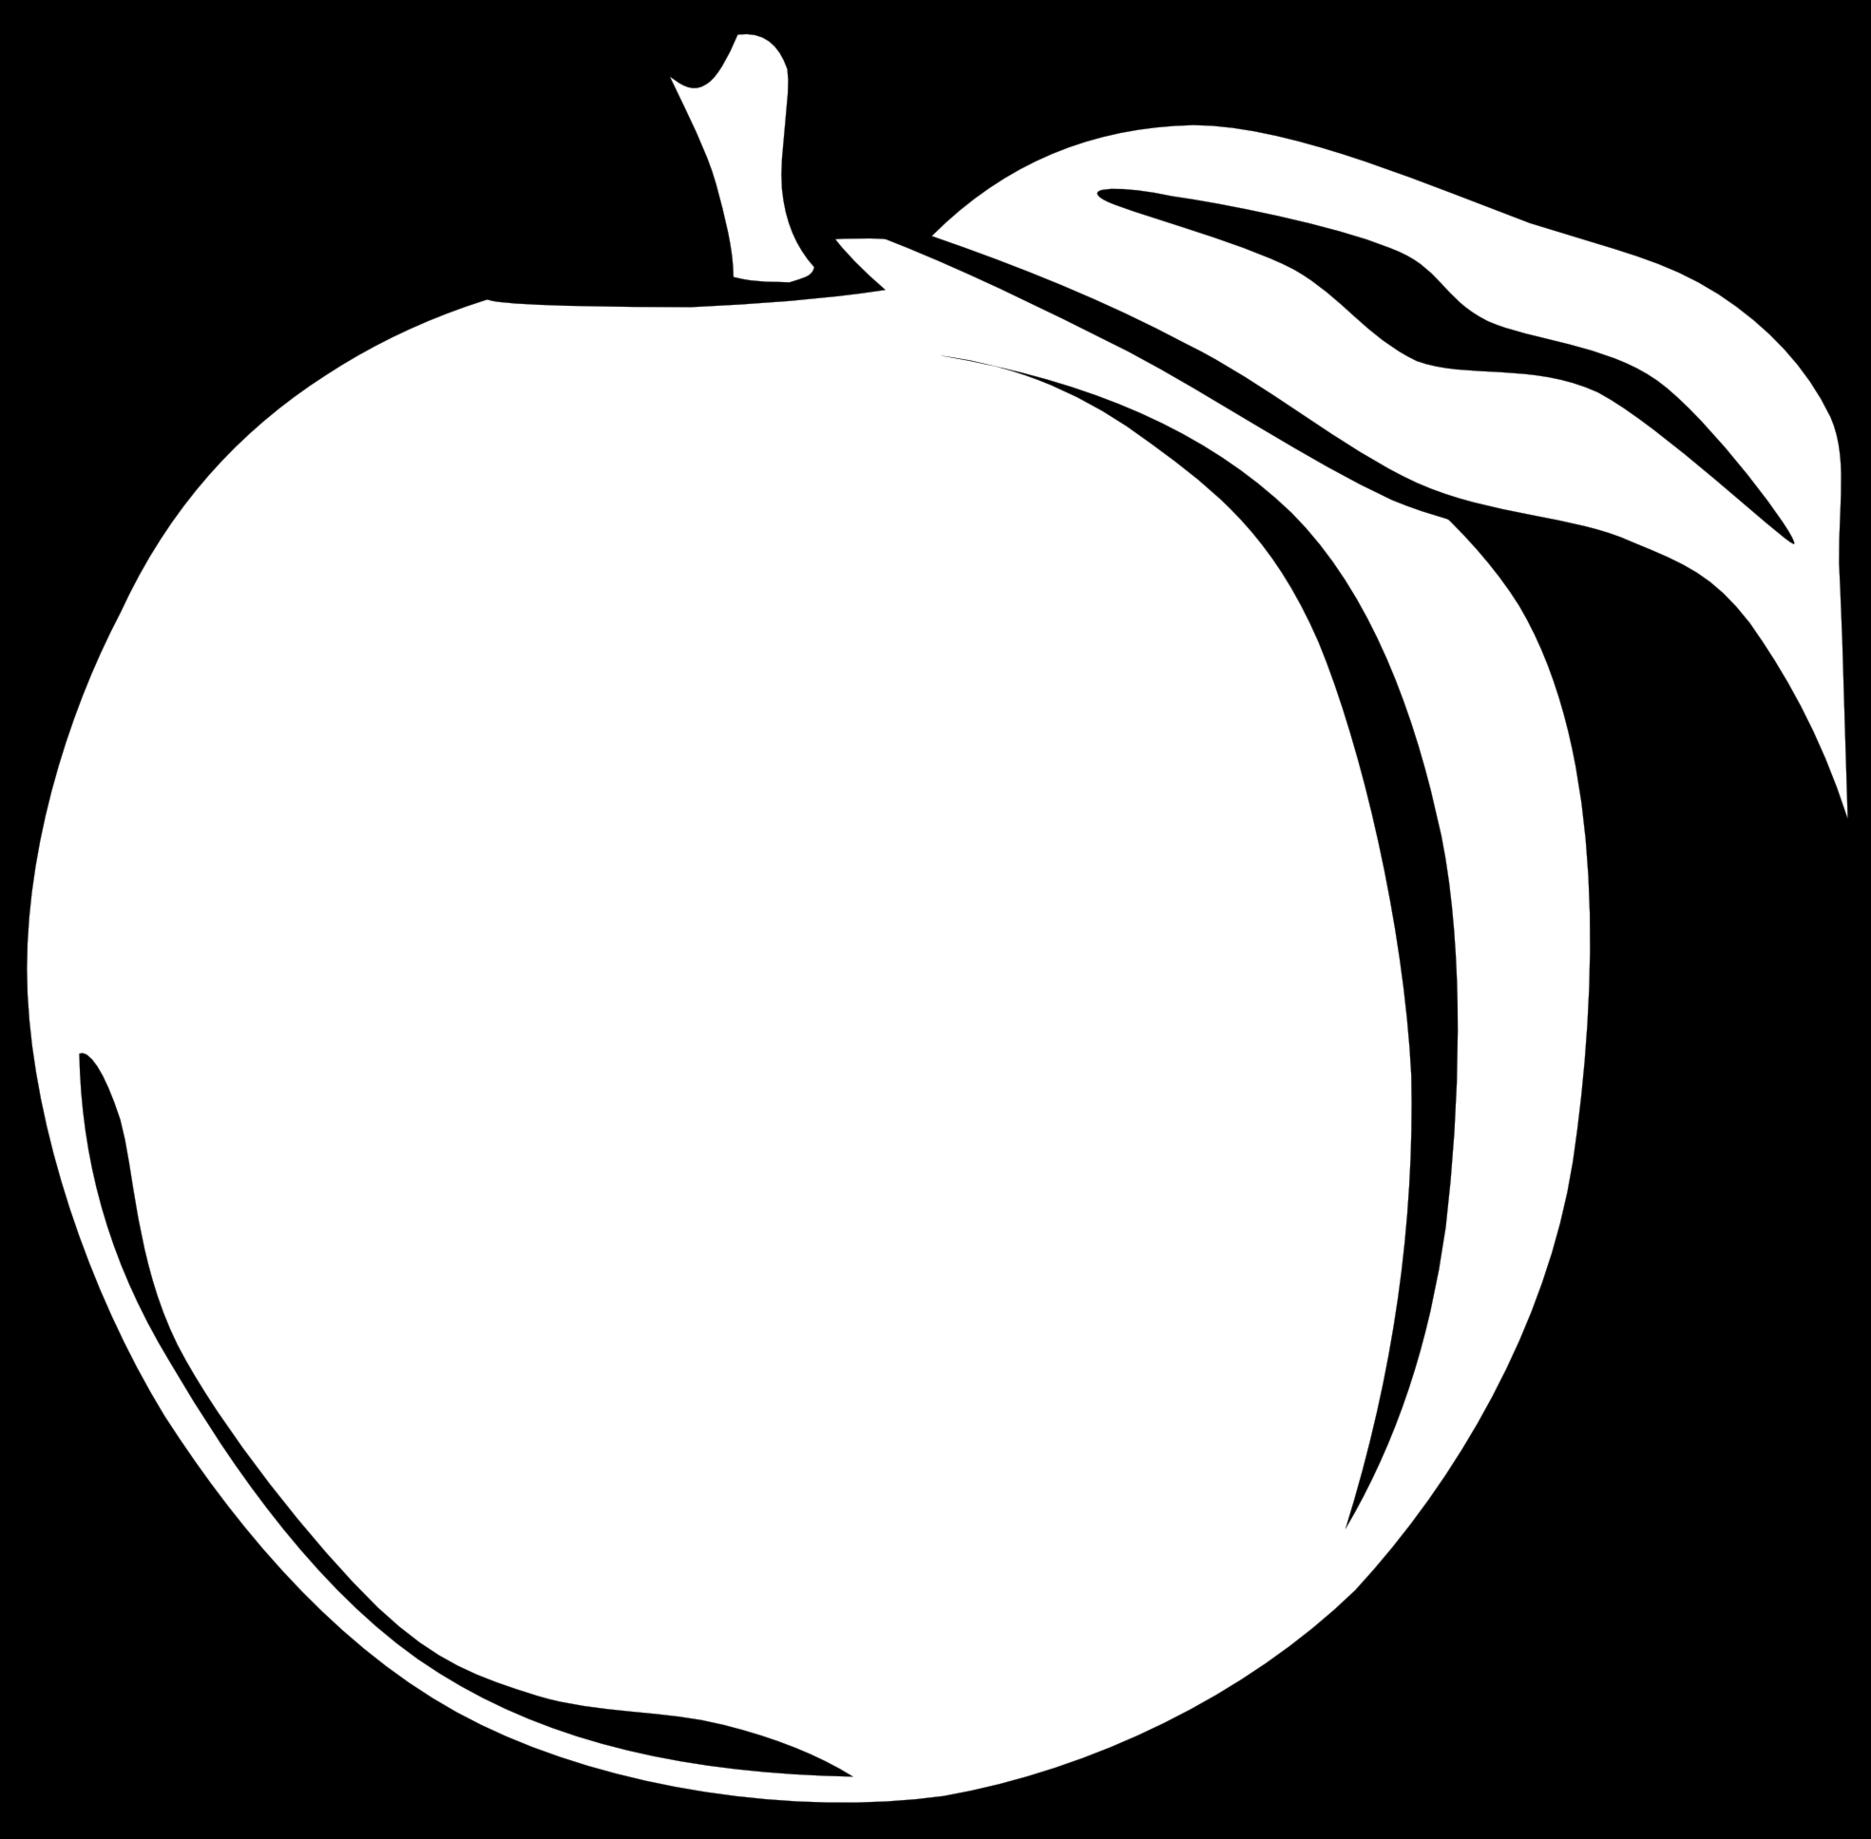 1871x1839 Orange (Fruit) Clipart Black And White